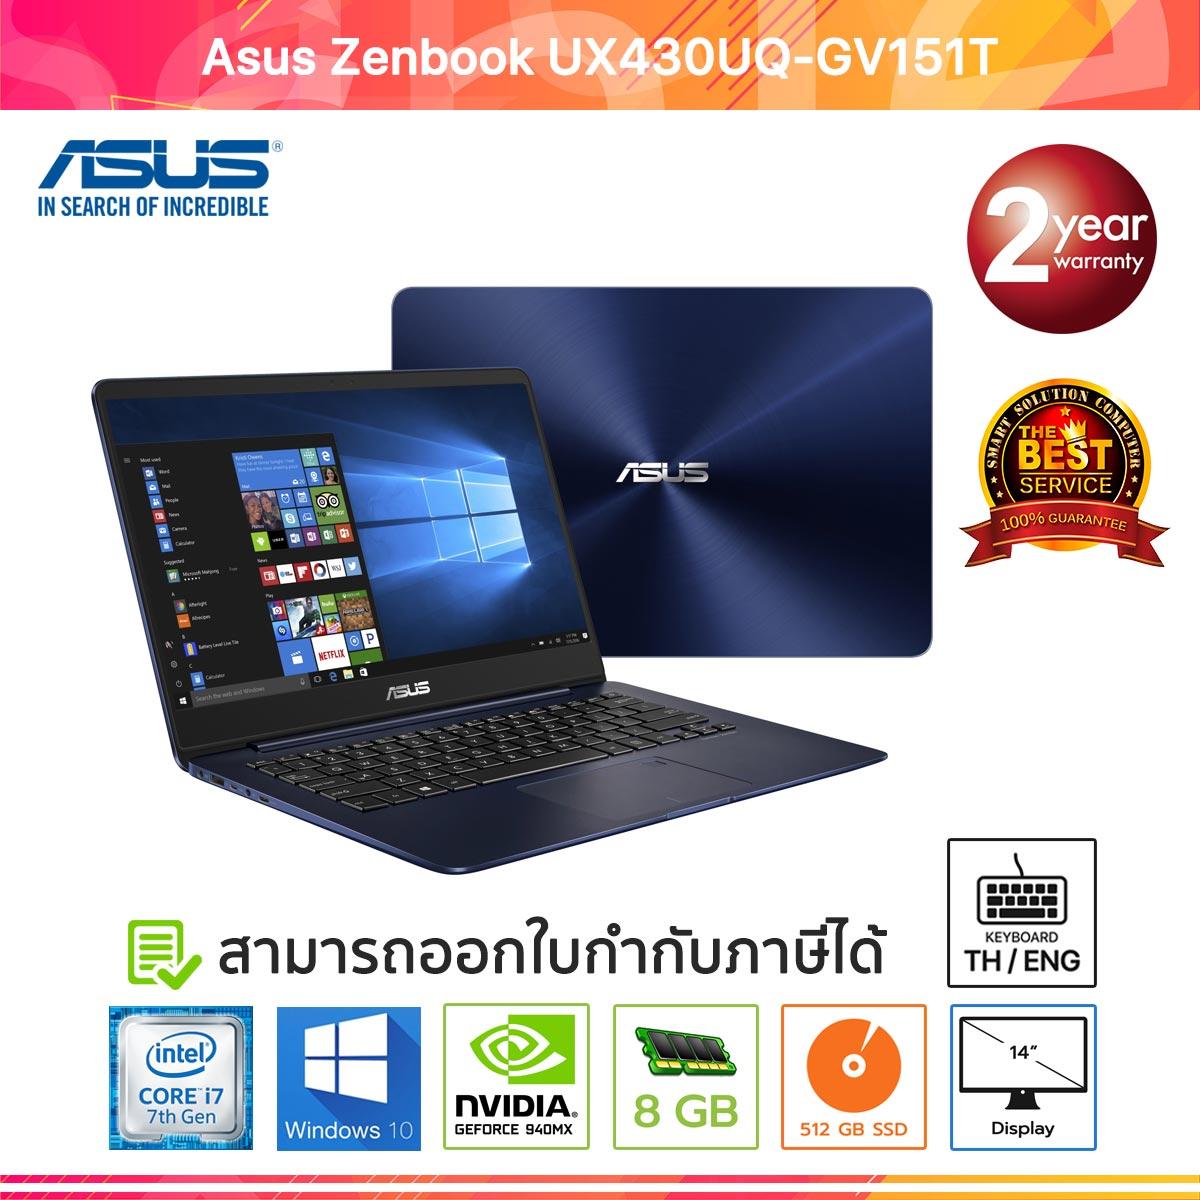 Asus Zenbook UX430UQ-GV151T i7-7500U/8GB/512GB SSD/GeForce 940MX/14